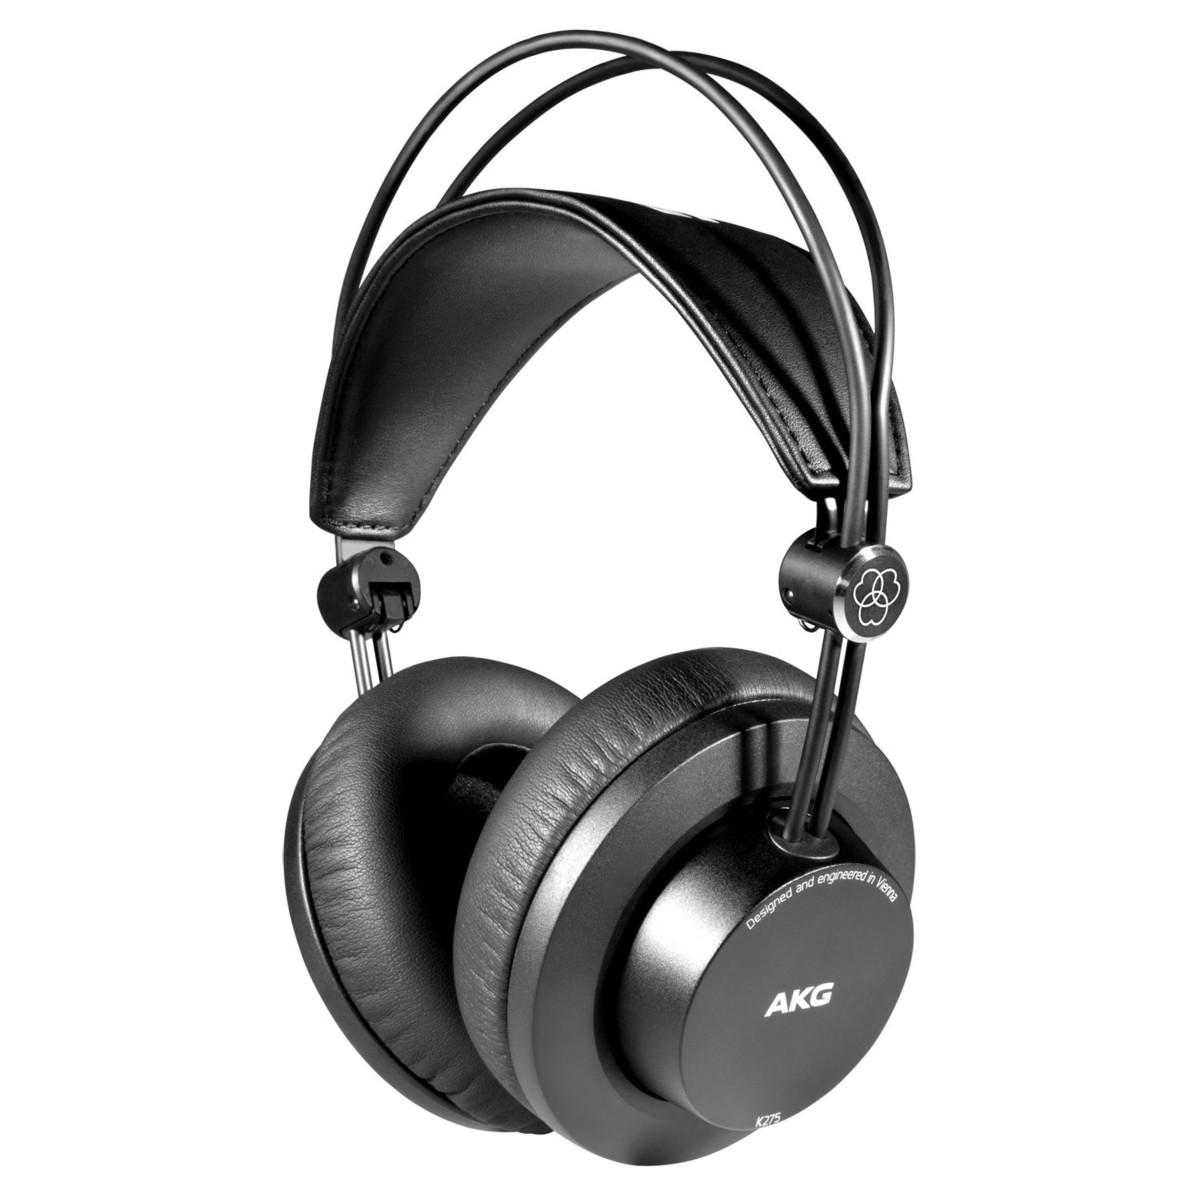 AKG K275 cuffie. AKG K275 Headphones - Angled. Loading zoom a8923e2e70d1